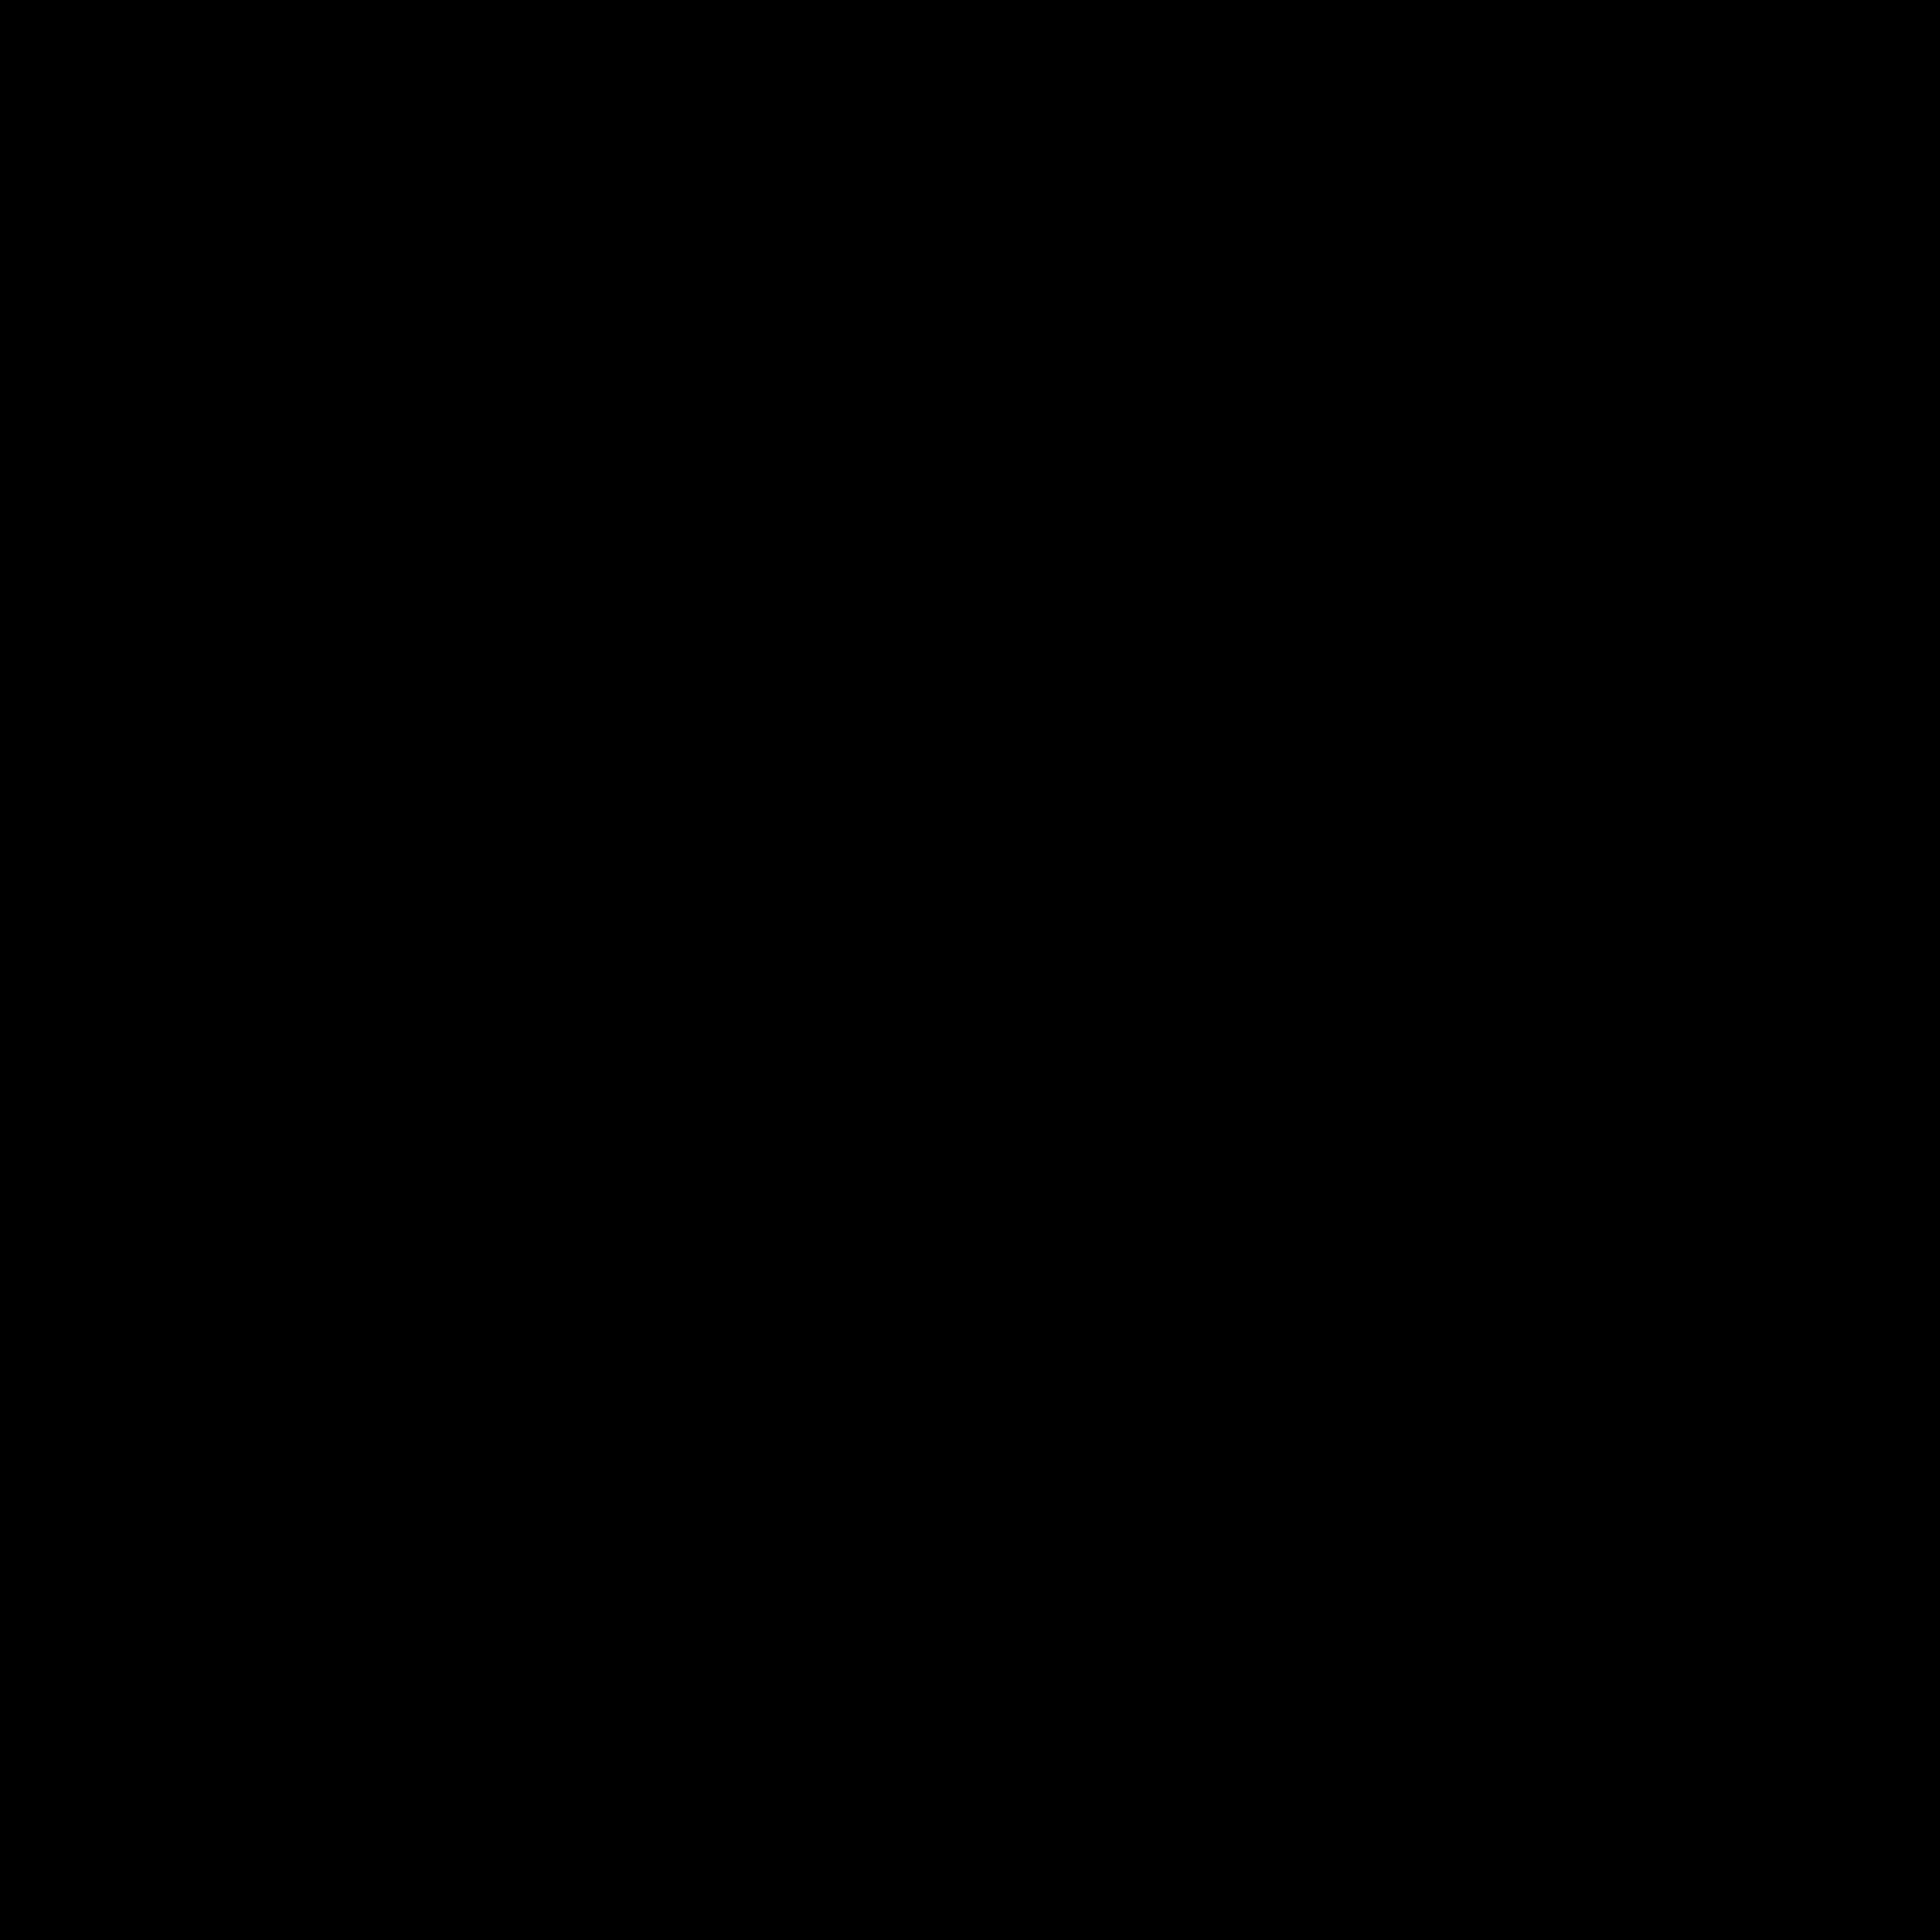 LYNX Logo PNG Transparent & SVG Vector.